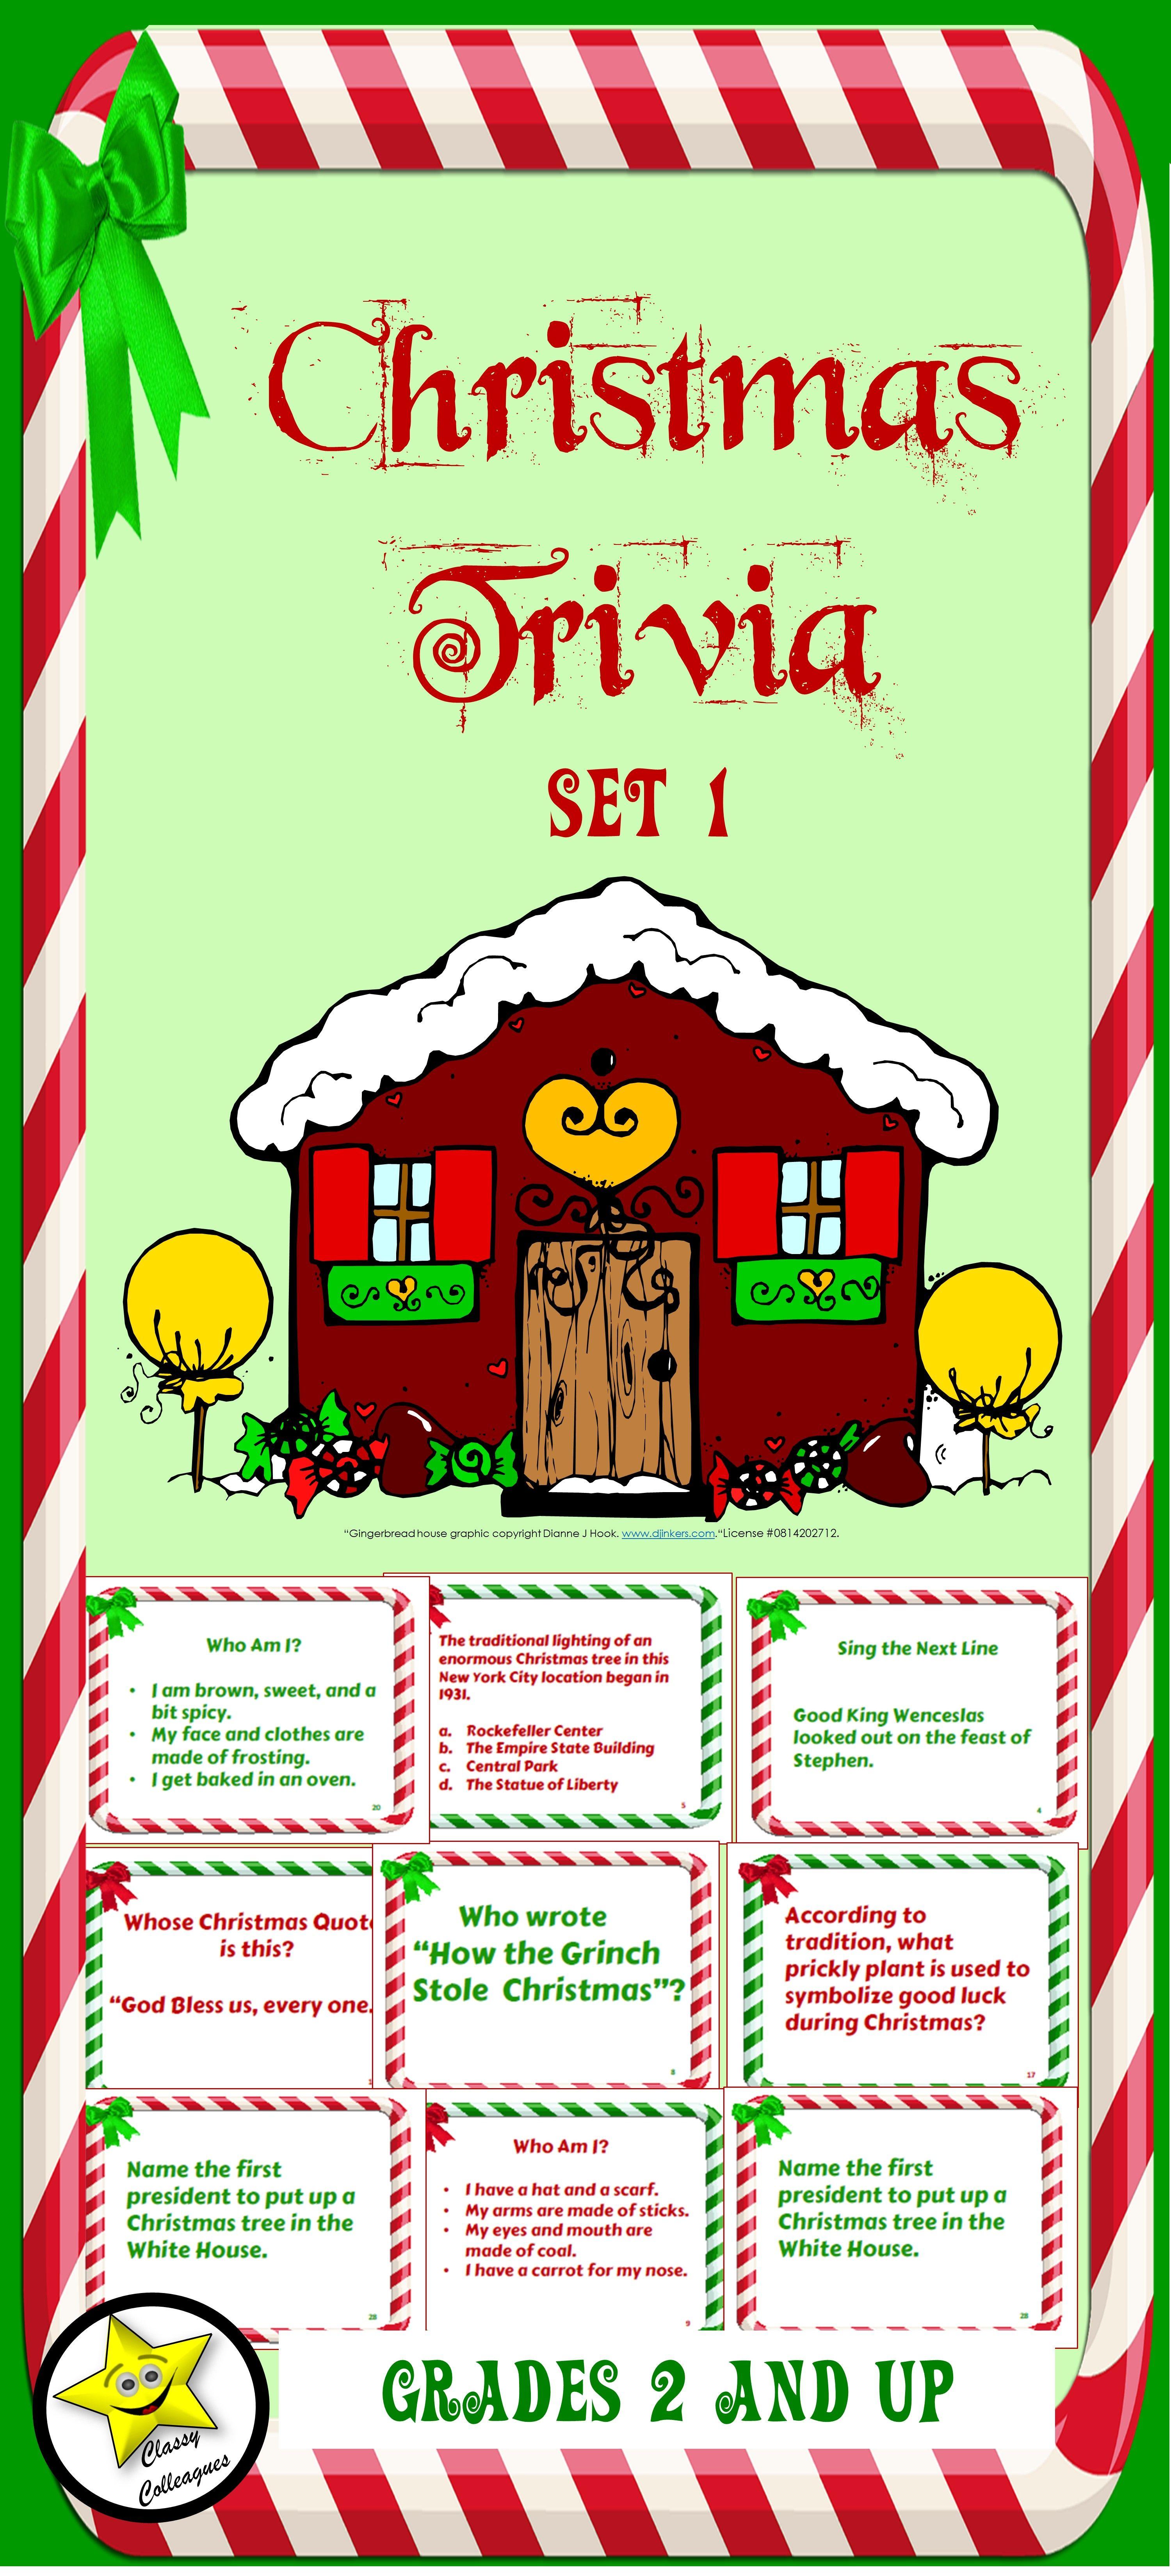 Christmas Trivia Set 1